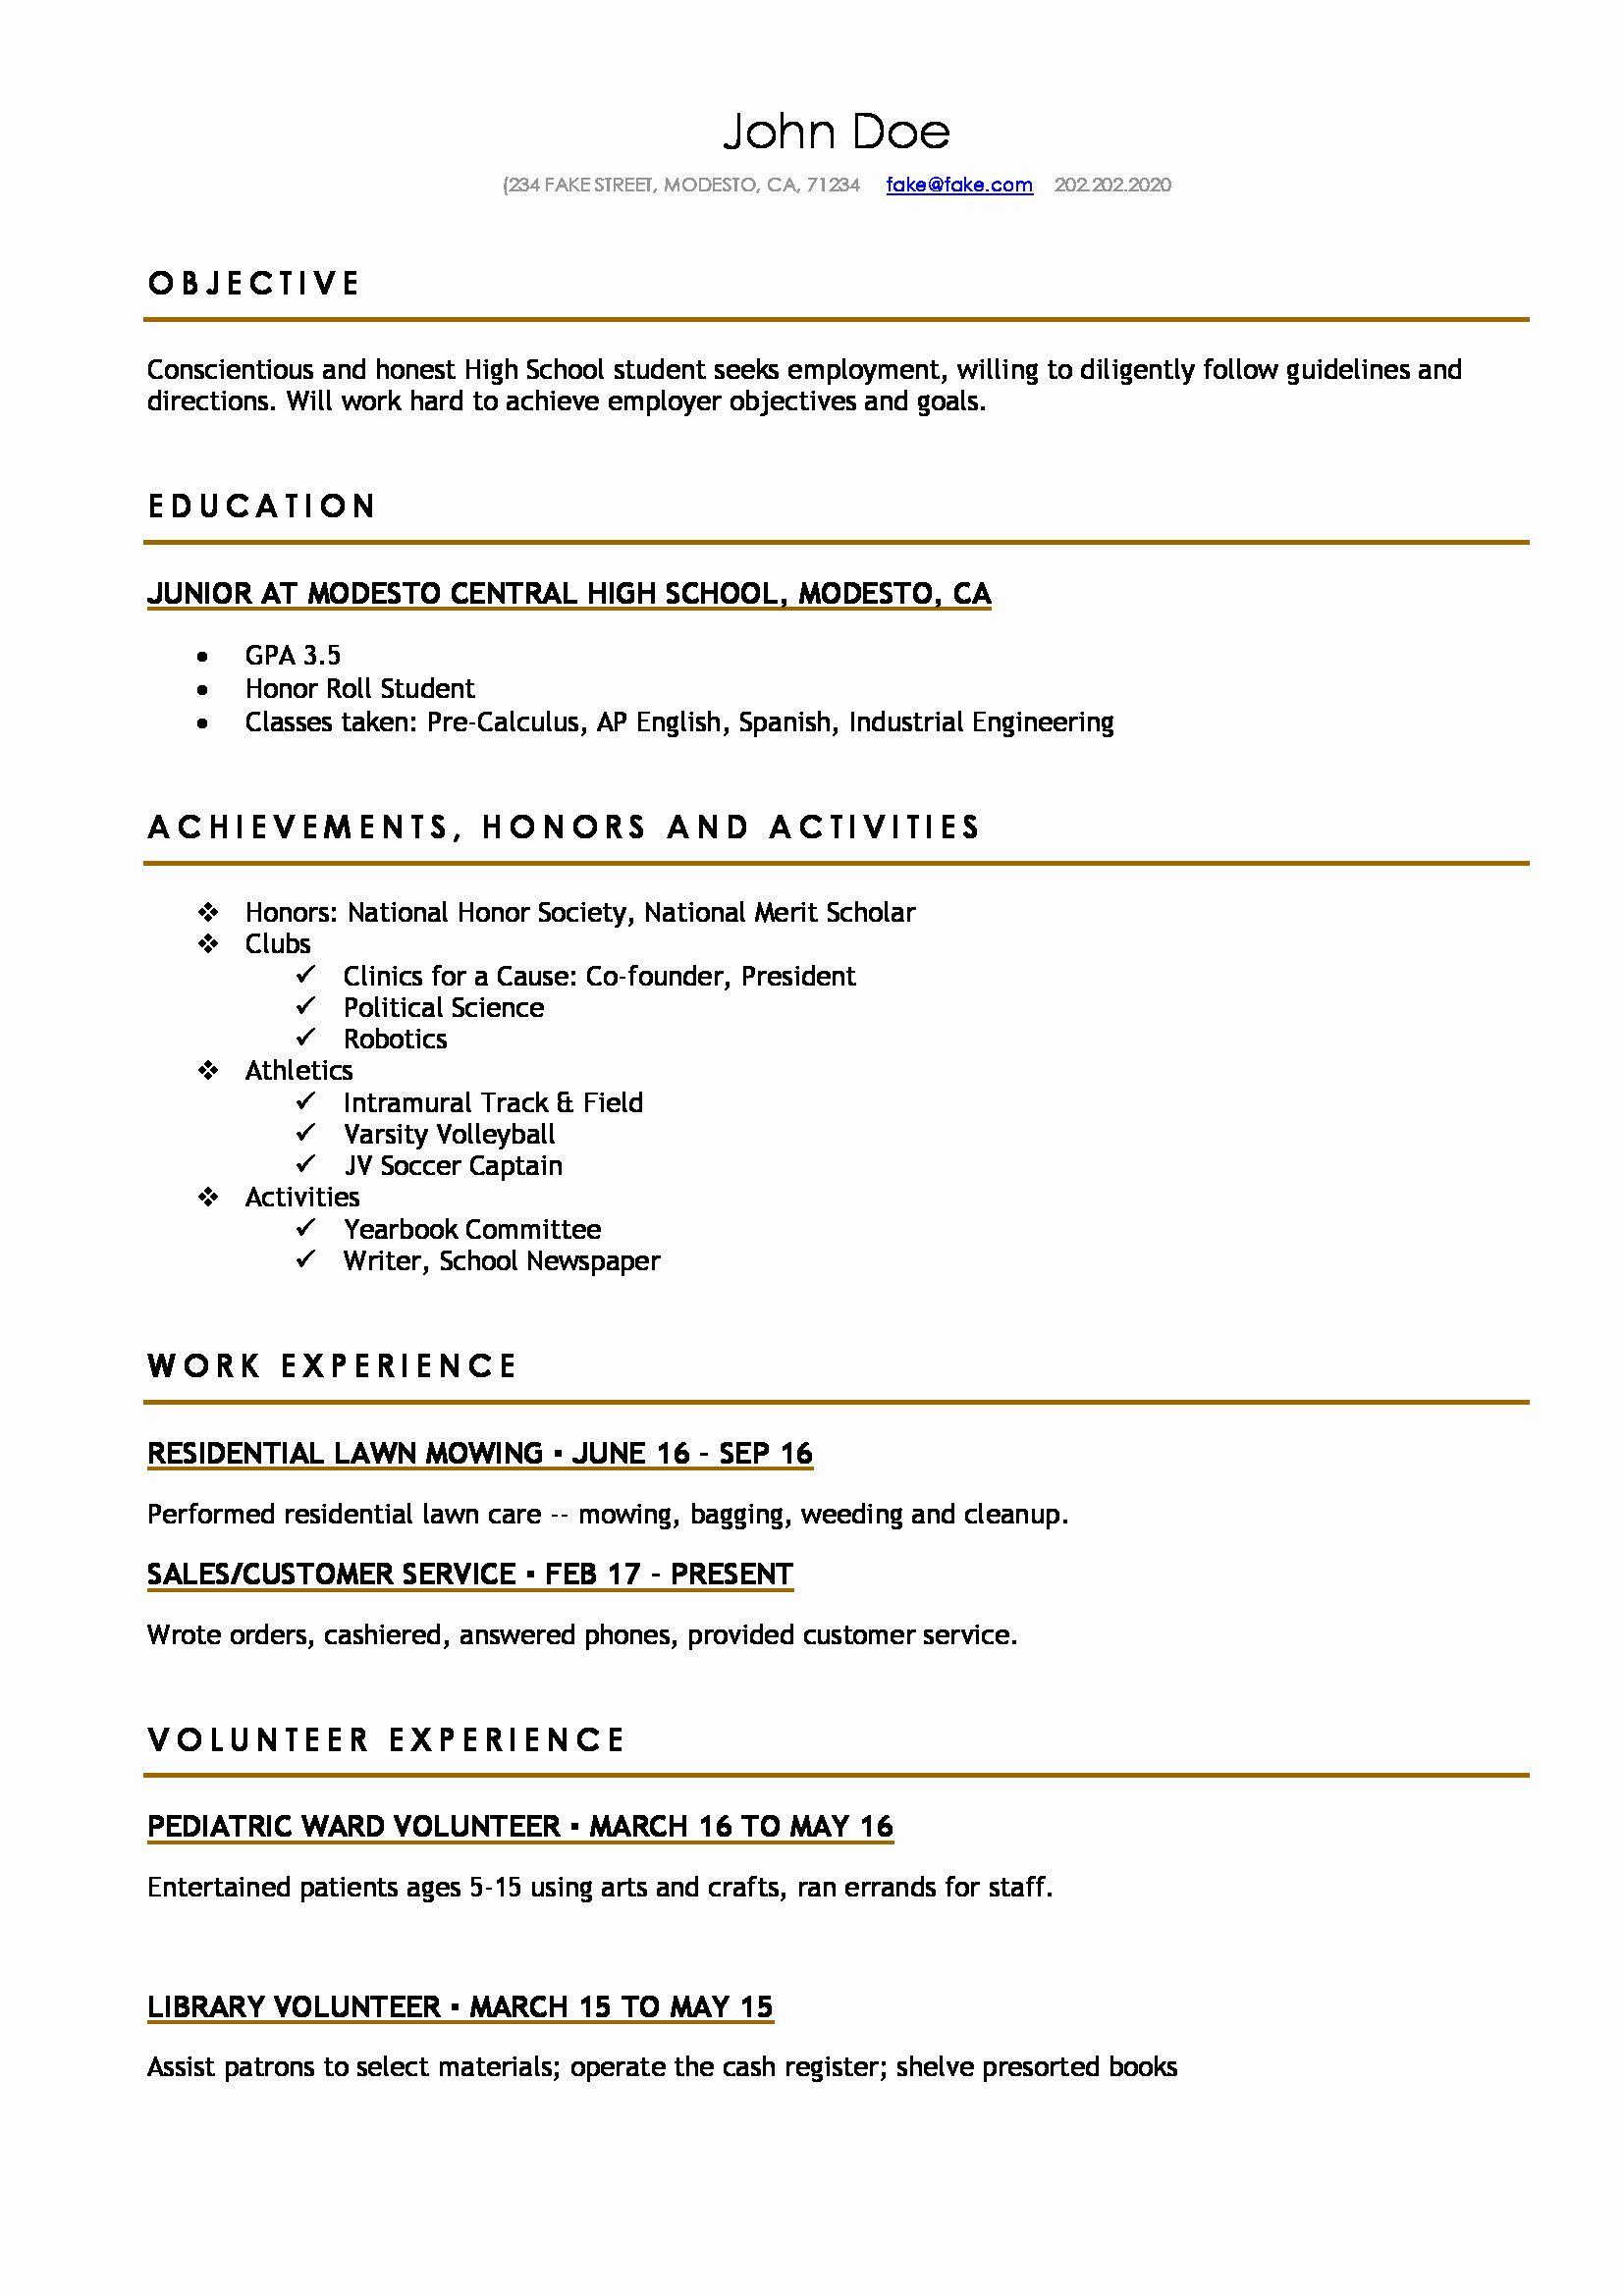 High School Student Resume Objective Elegant High School Resume Resumes Perfect For High Student Resume Template High School Resume High School Resume Template